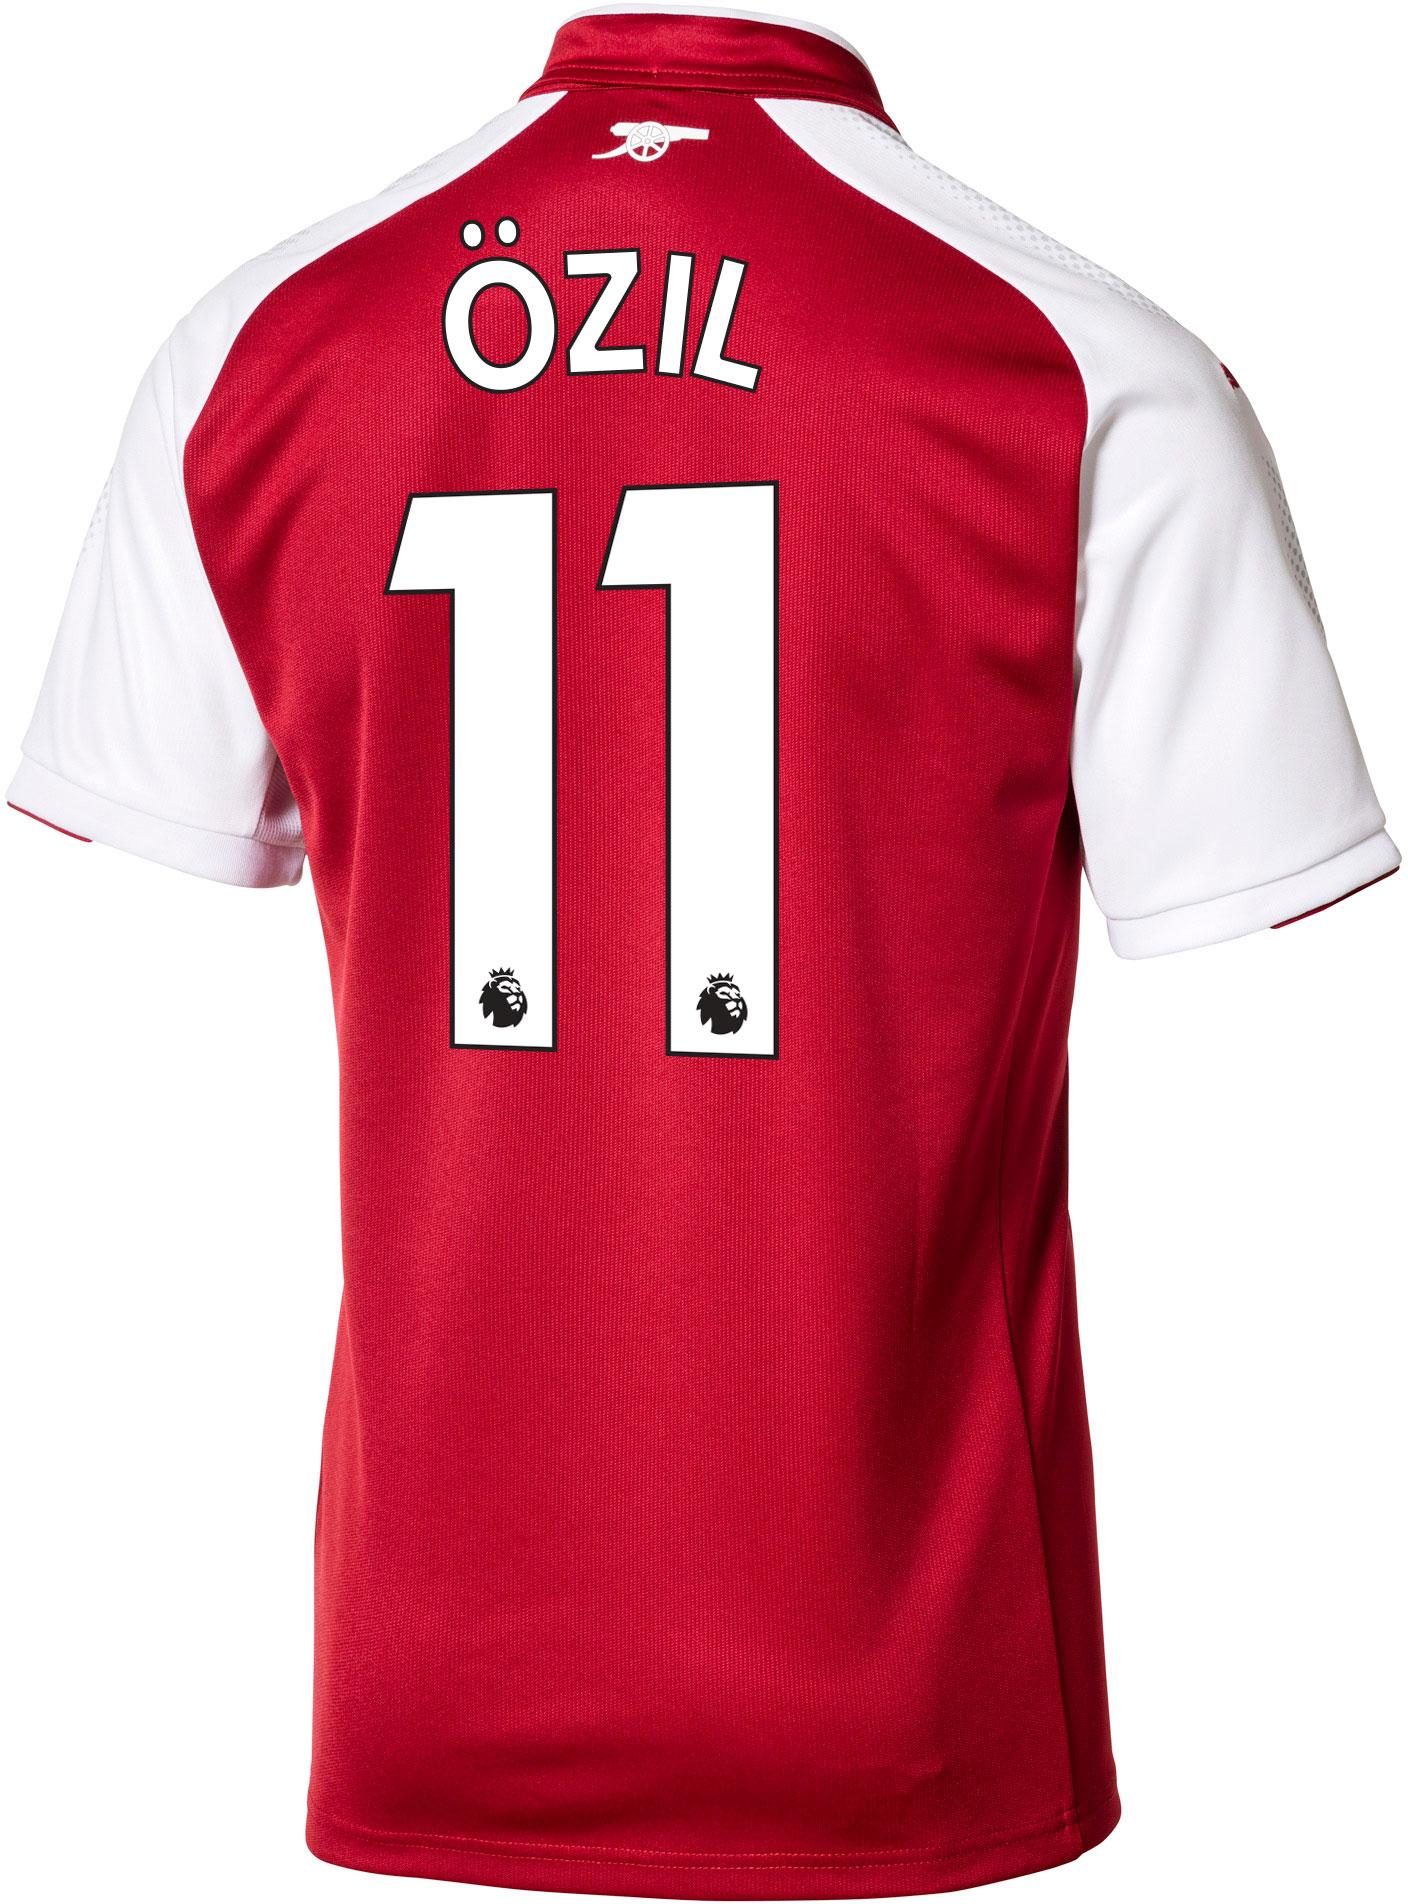 Puma Mesut Ozil Arsenal Home Jersey 2017-18